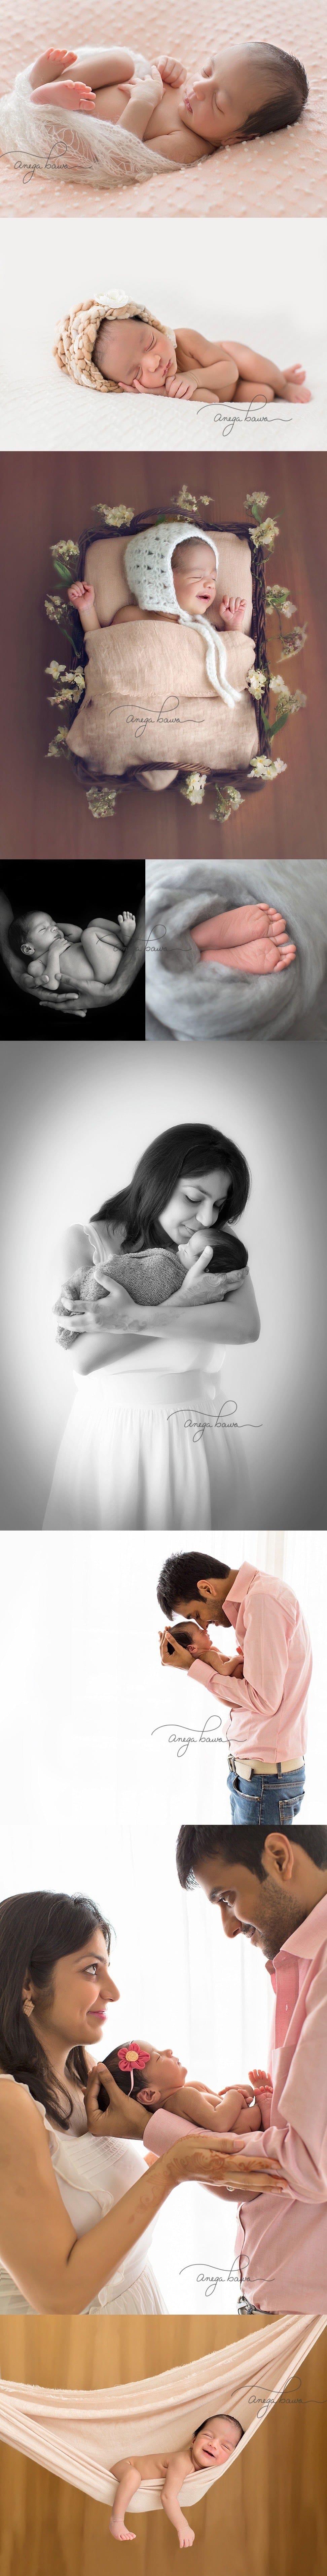 newborn photographer in india